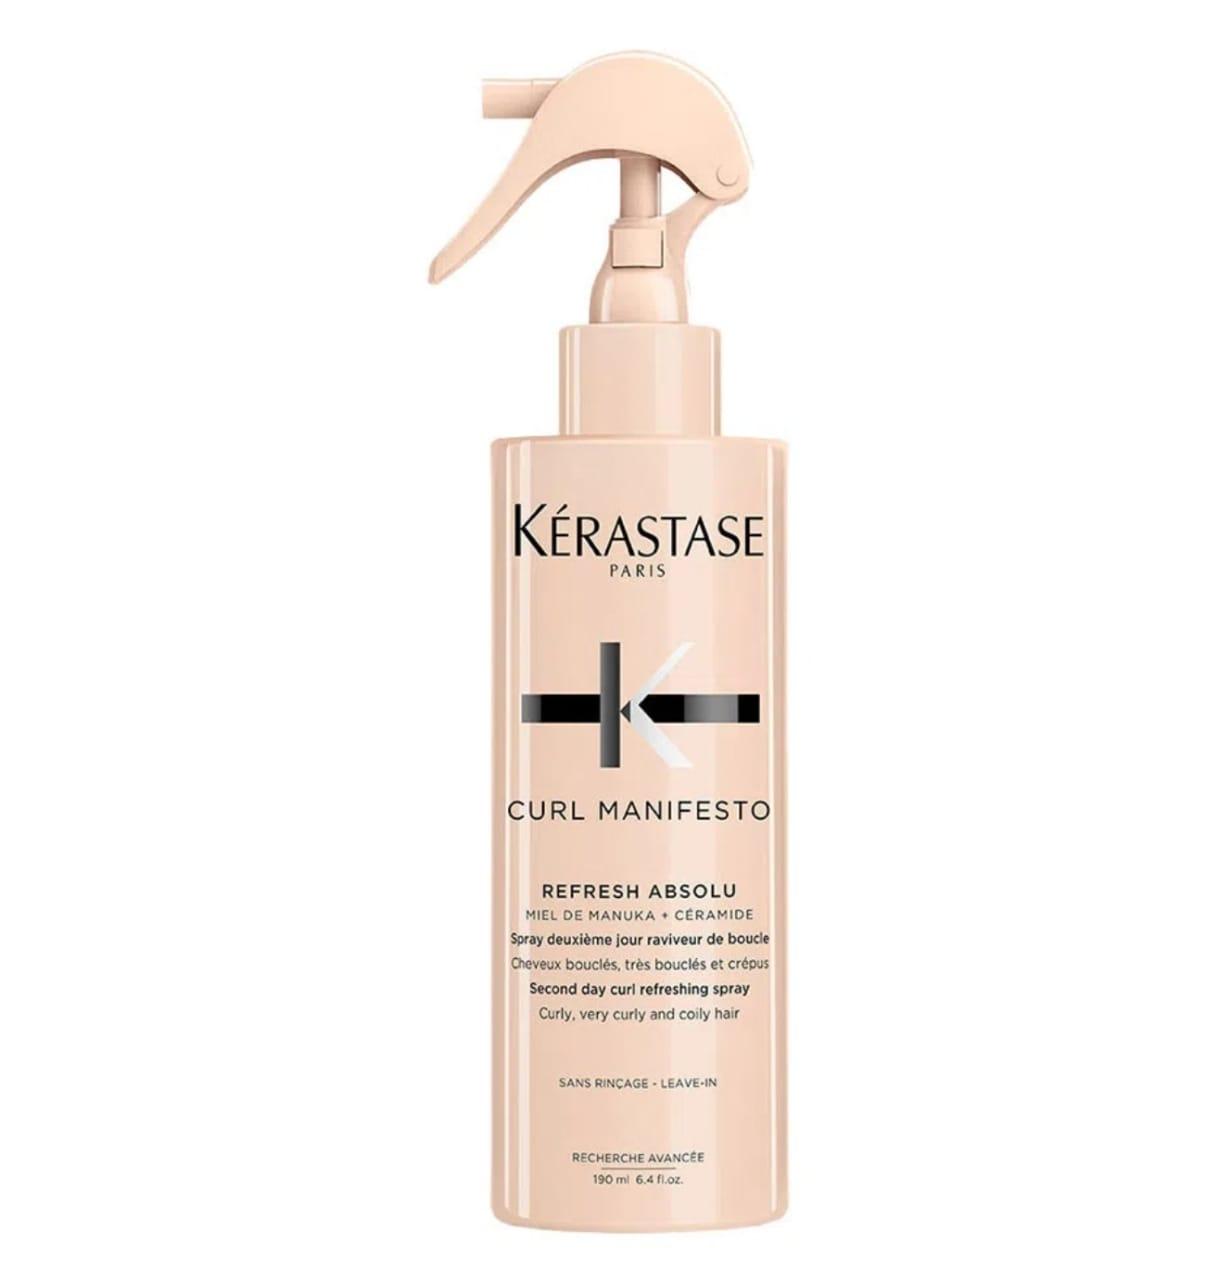 Kerastase Curl Manifesto Refresh Absolu- Spray capilar 190ml